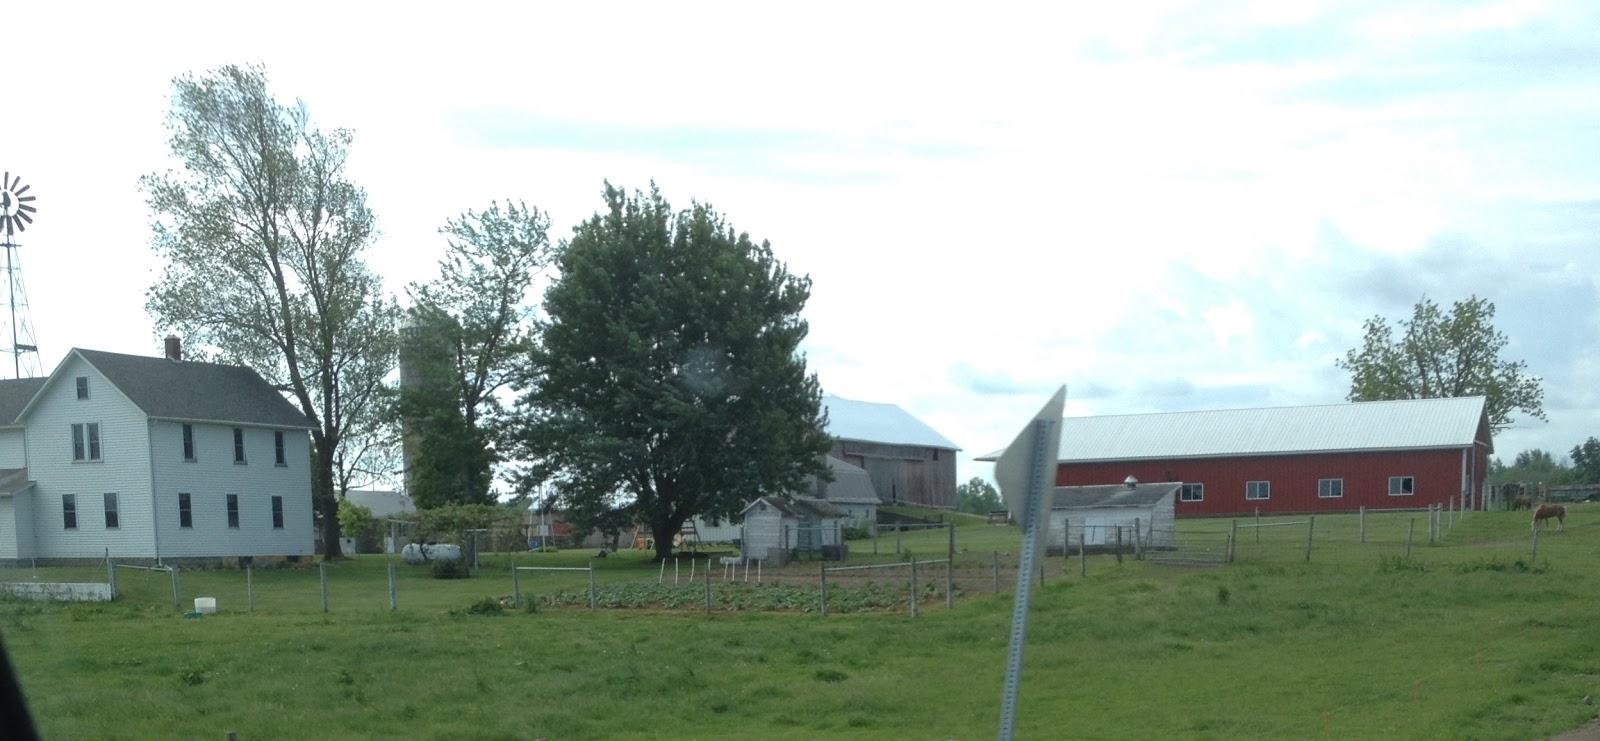 Amish horses amish farm tour for Amish pole barns indiana